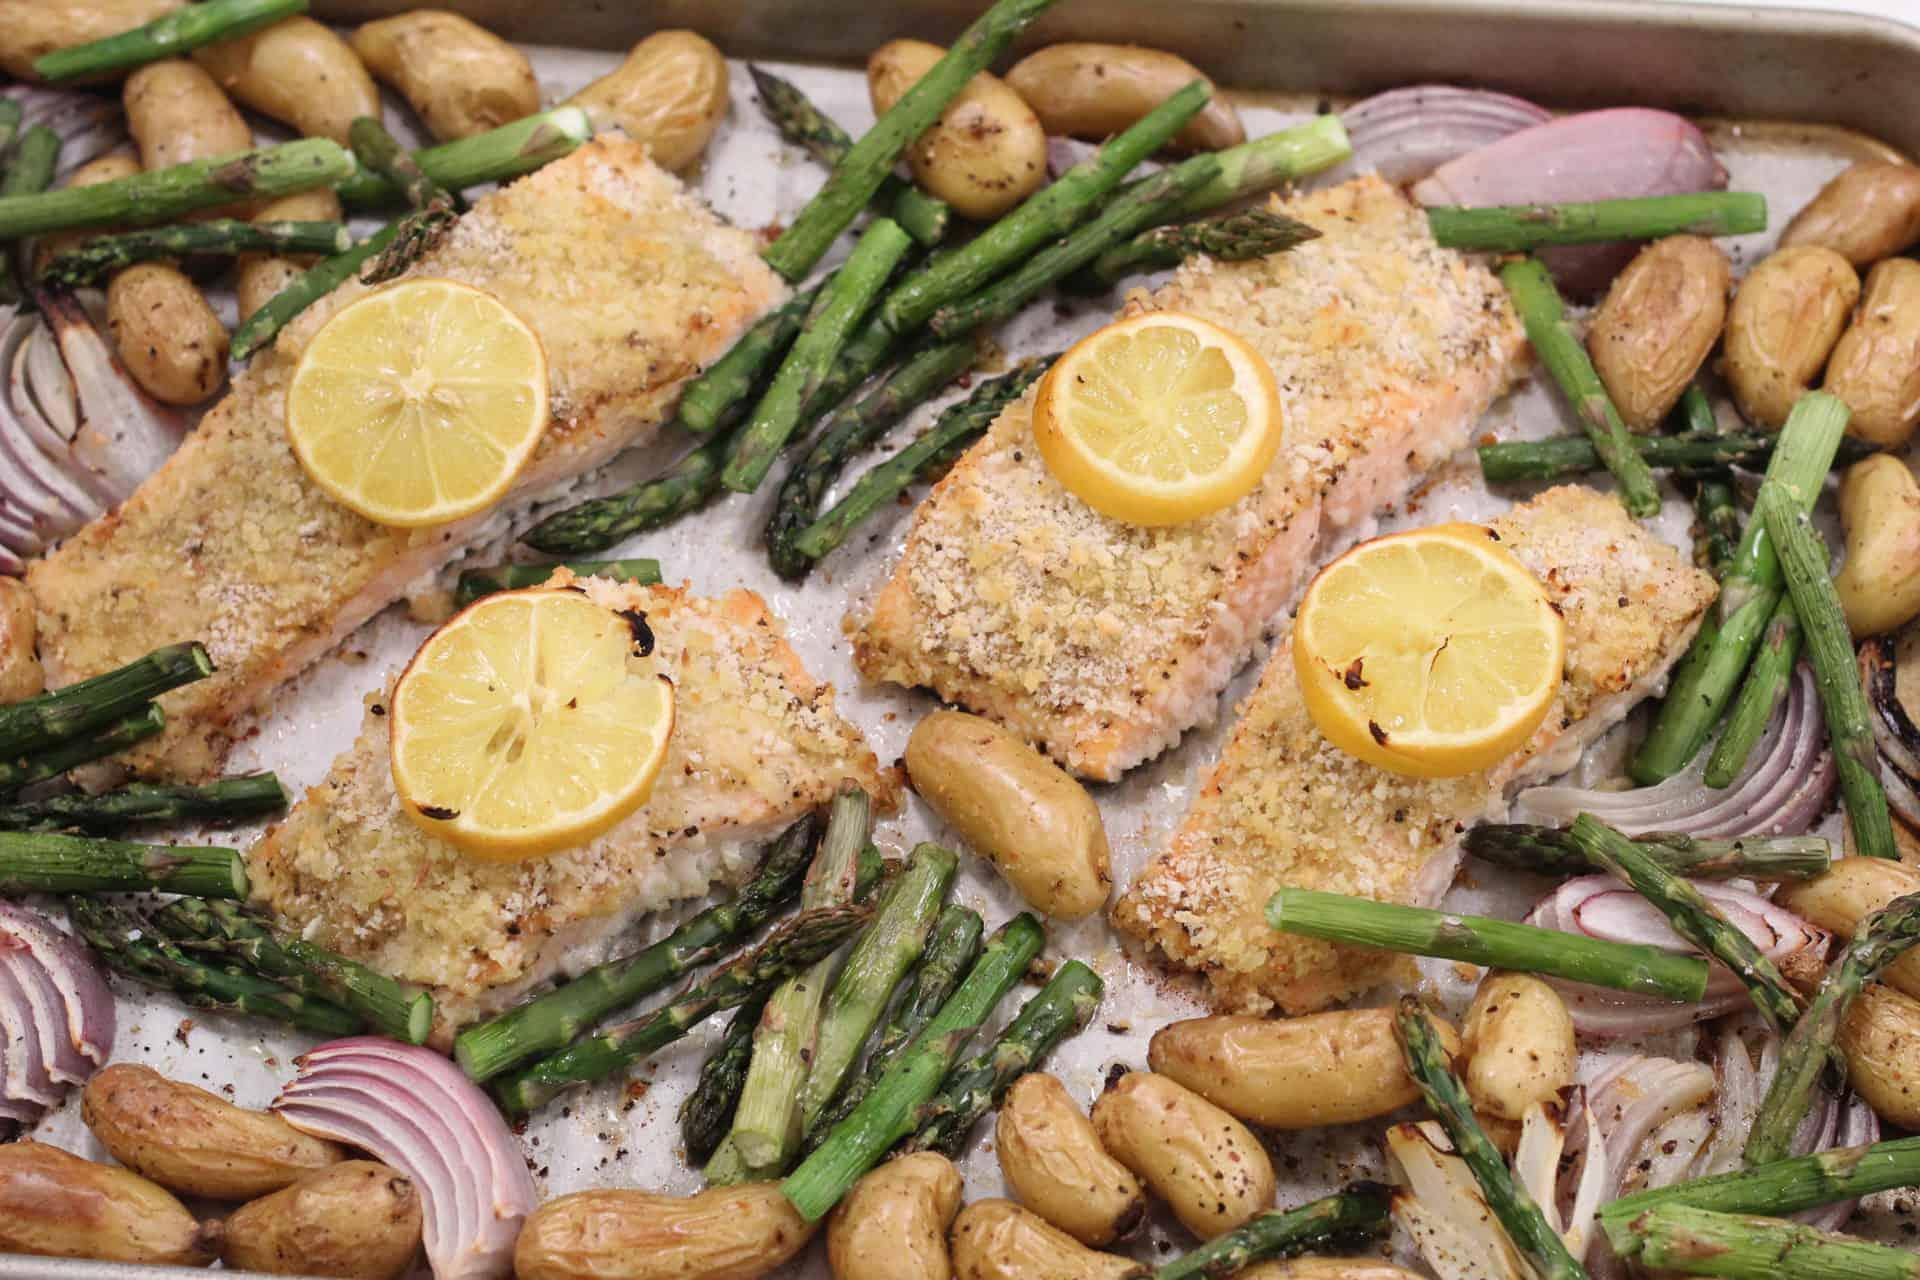 Salmon, Seafood, Fish, Sheet Pan, Quick & Easy, Spring, Asparagus, Potatoes, Dinner